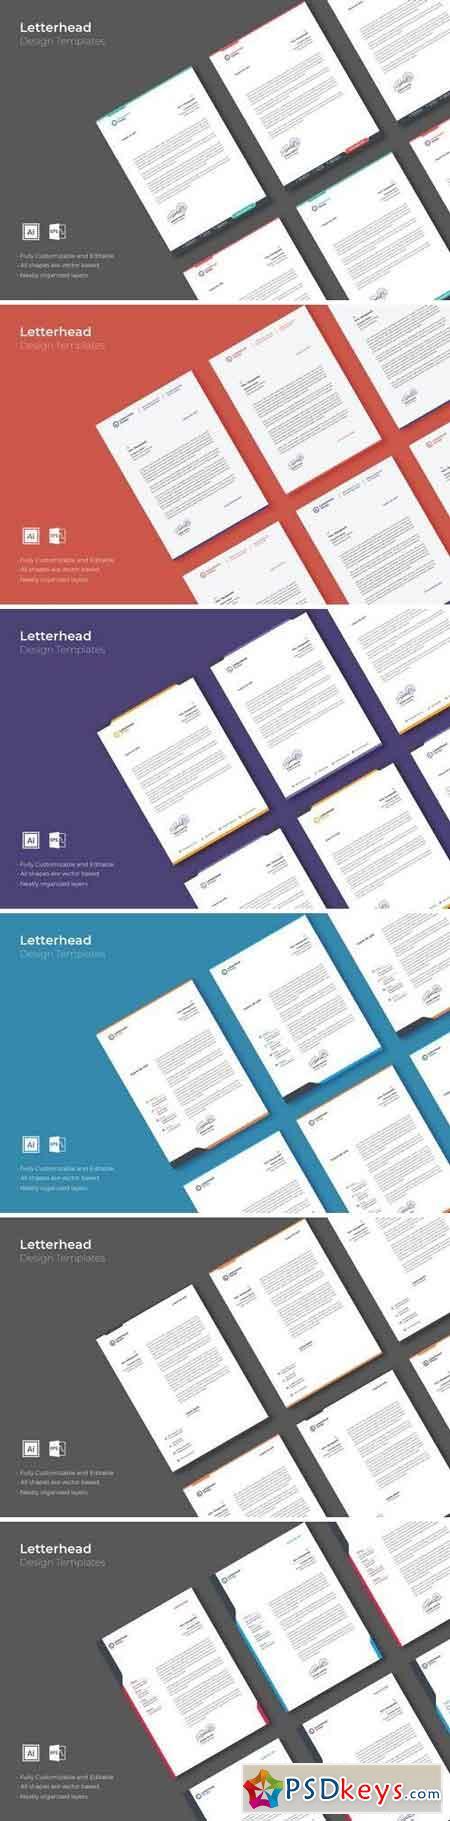 ADL-Letterhead Design Bundle